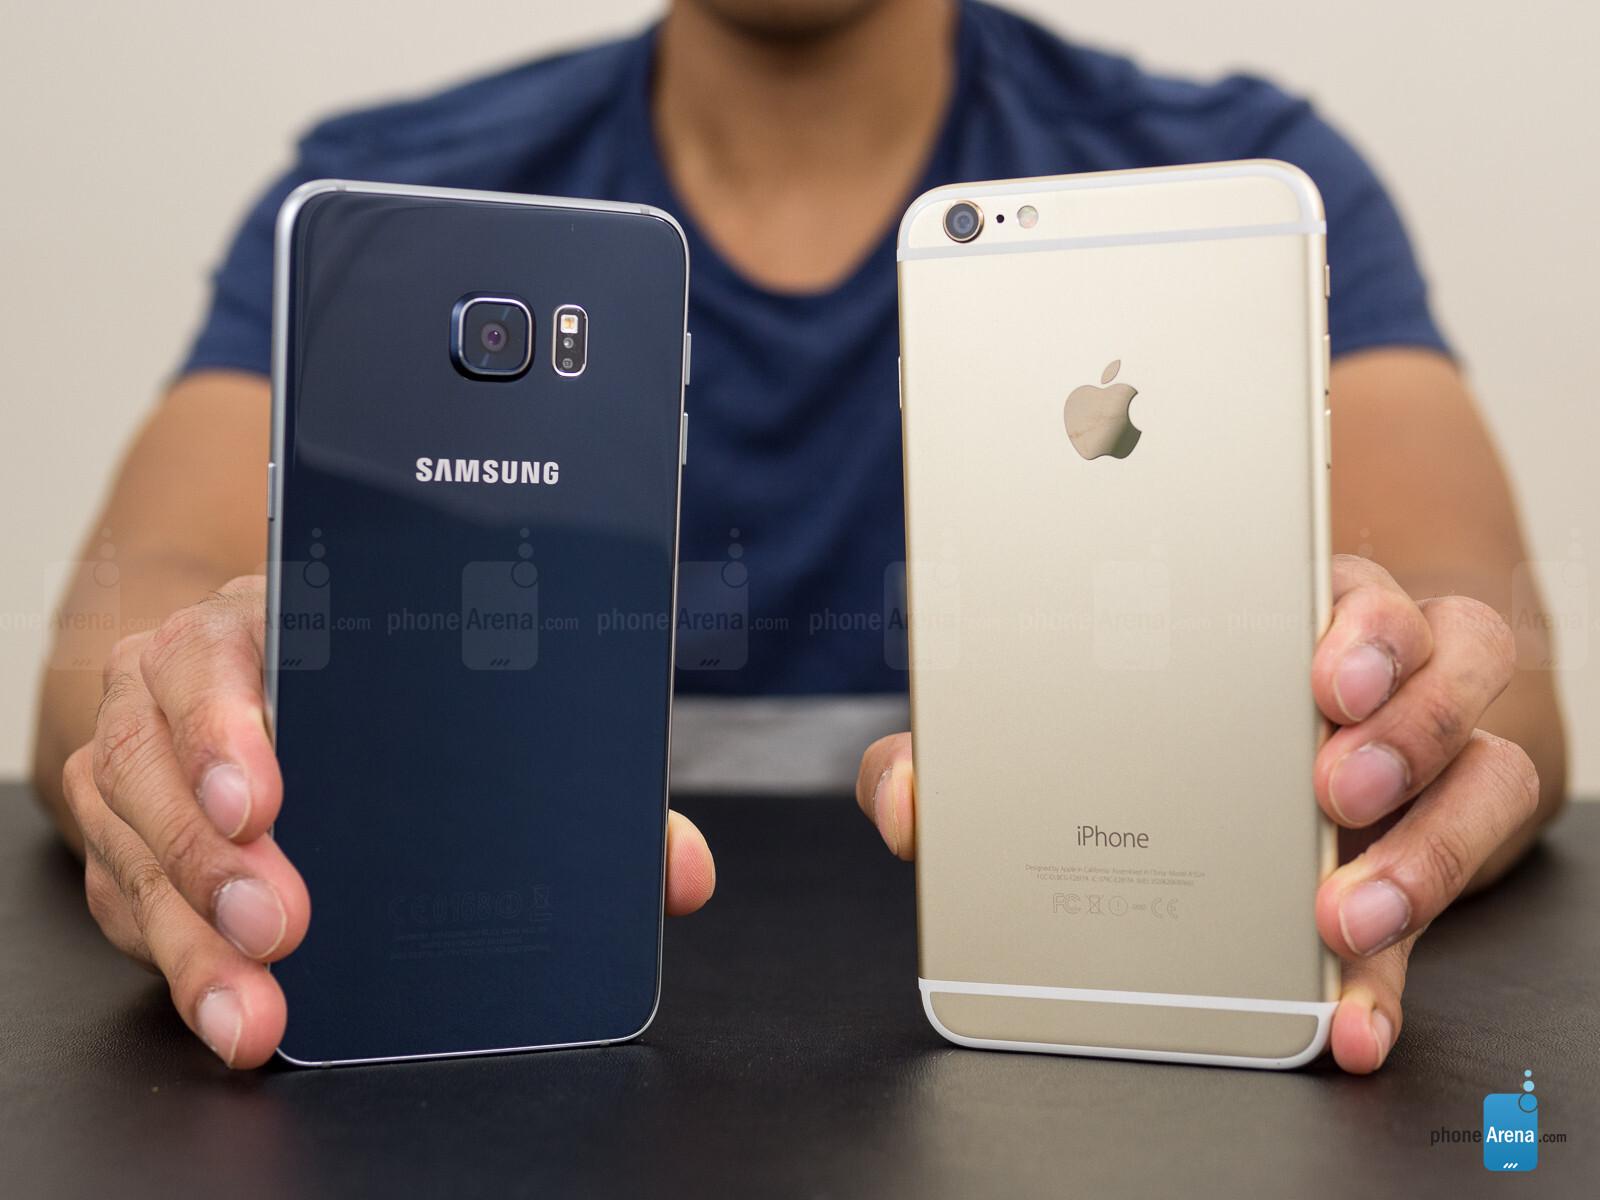 samsung galaxy s6 edge vs apple iphone 6 plus. Black Bedroom Furniture Sets. Home Design Ideas